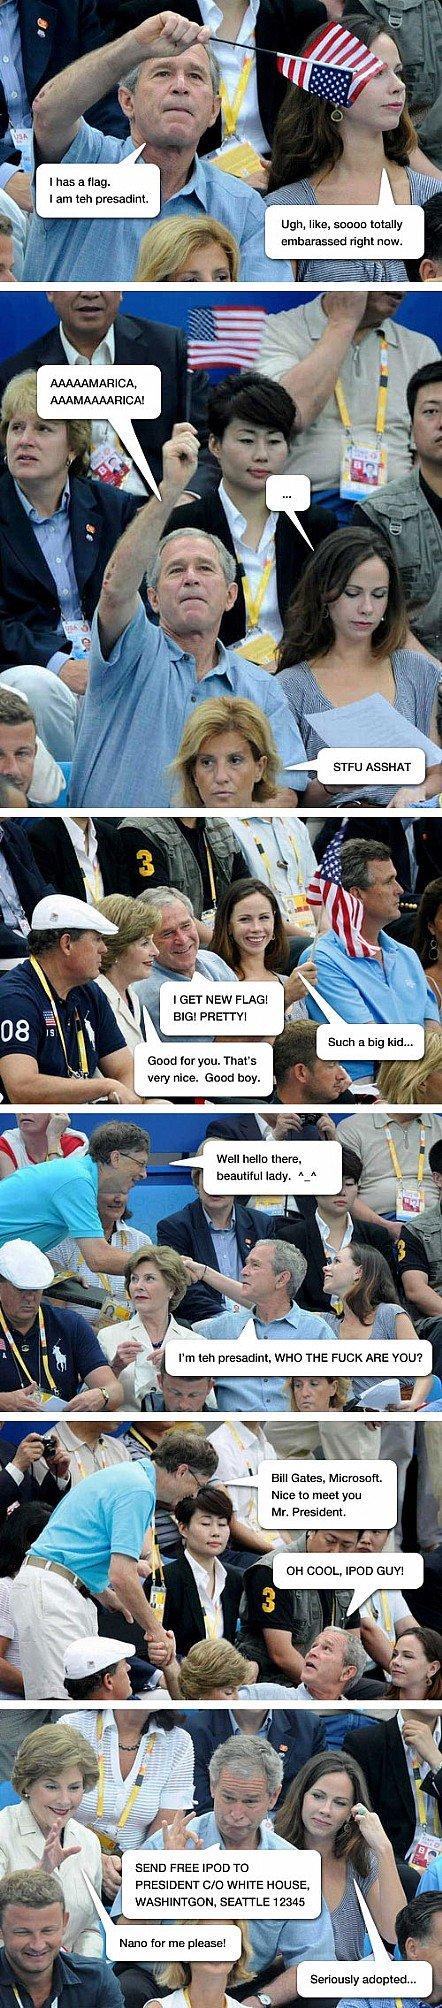 The Bush Family. Hopefully not re-toast <br /> Credit to lolrandom.com. I has a mag. am ten ' Ugh, like, sauna , GET NEW FLAGG far you. That' s wear nice. bush funny dumb